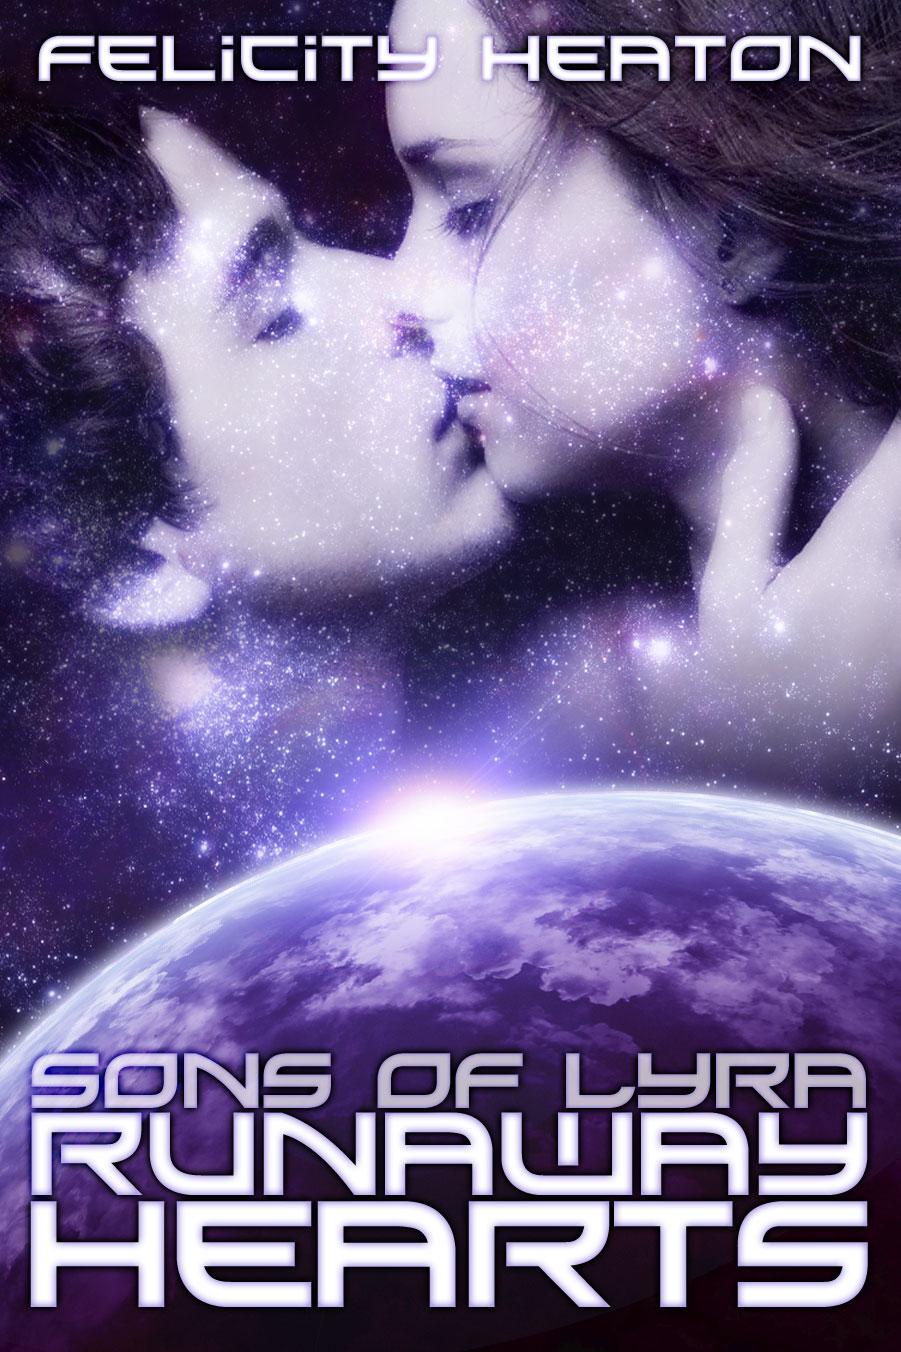 Felicity Heaton - Sons of Lyra: Runaway Hearts